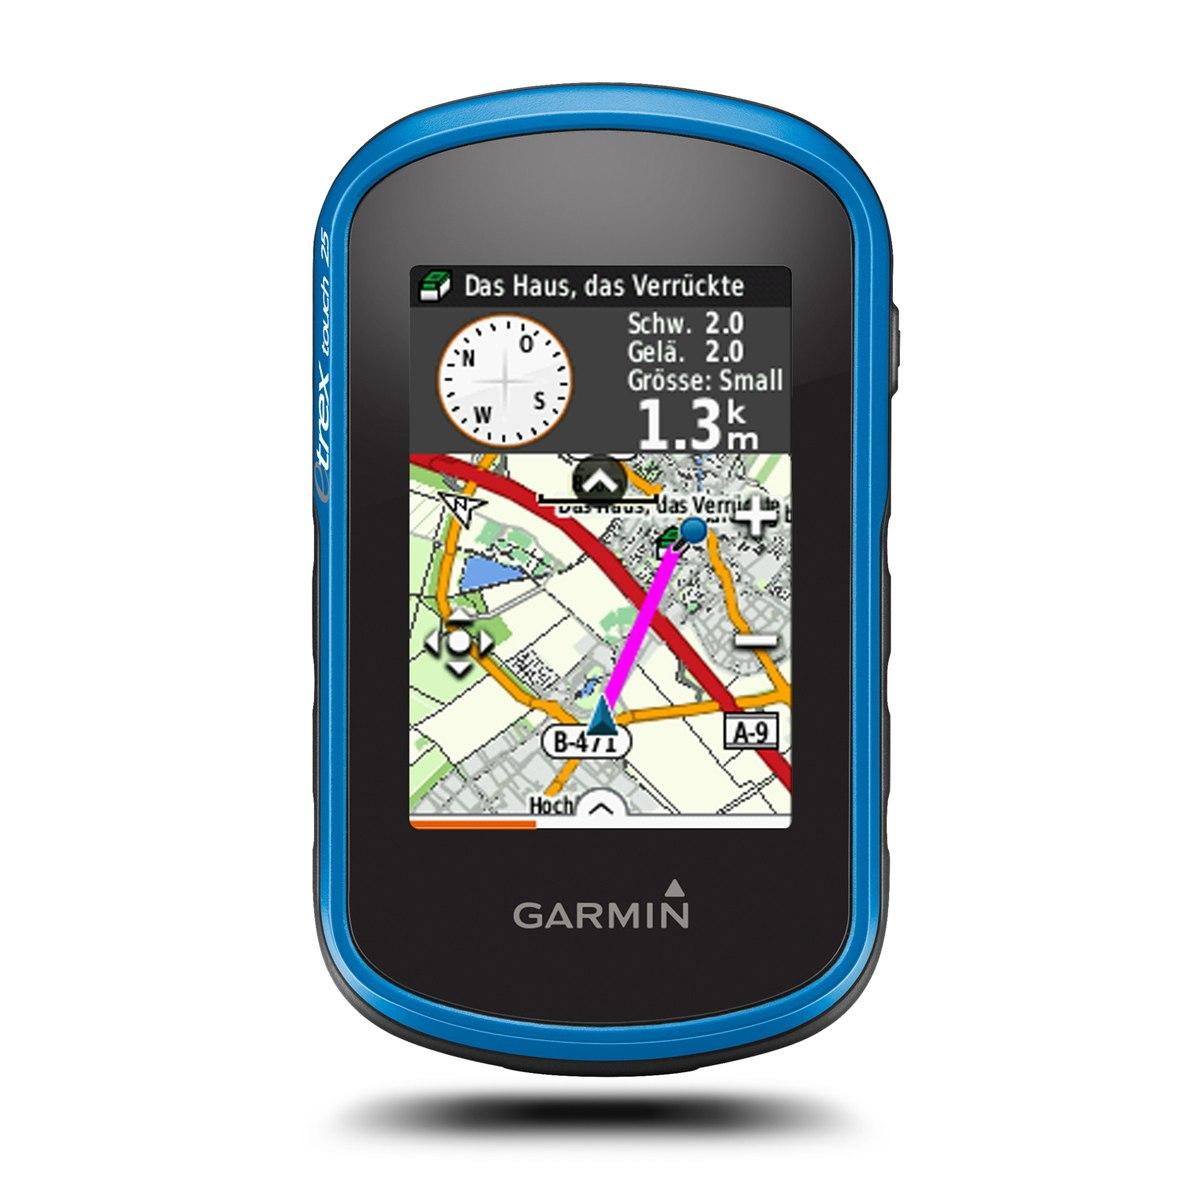 Garmin GPS eTrex Touch 25 Hand-Navigationsgerät + TopoActive Europa Karte - 010-01325-01